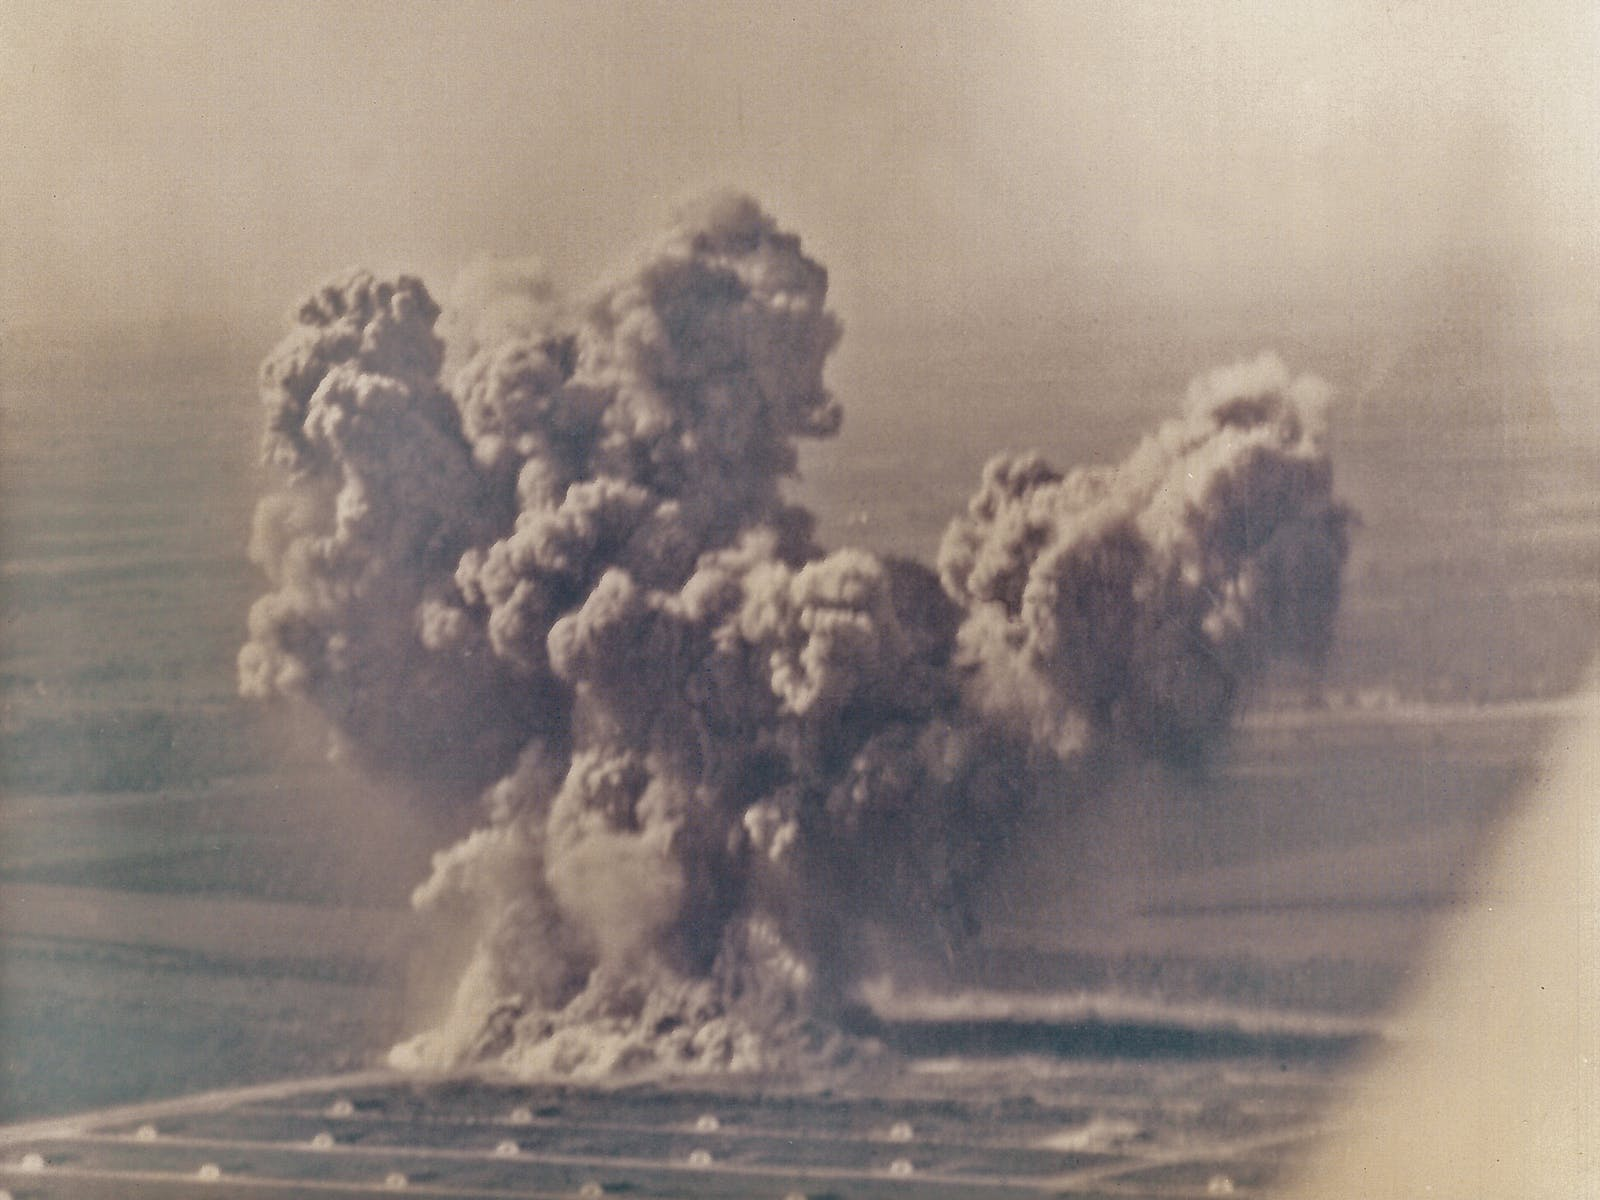 The explosion at Medina Annex, in San Antonio, on November 13, 1963.